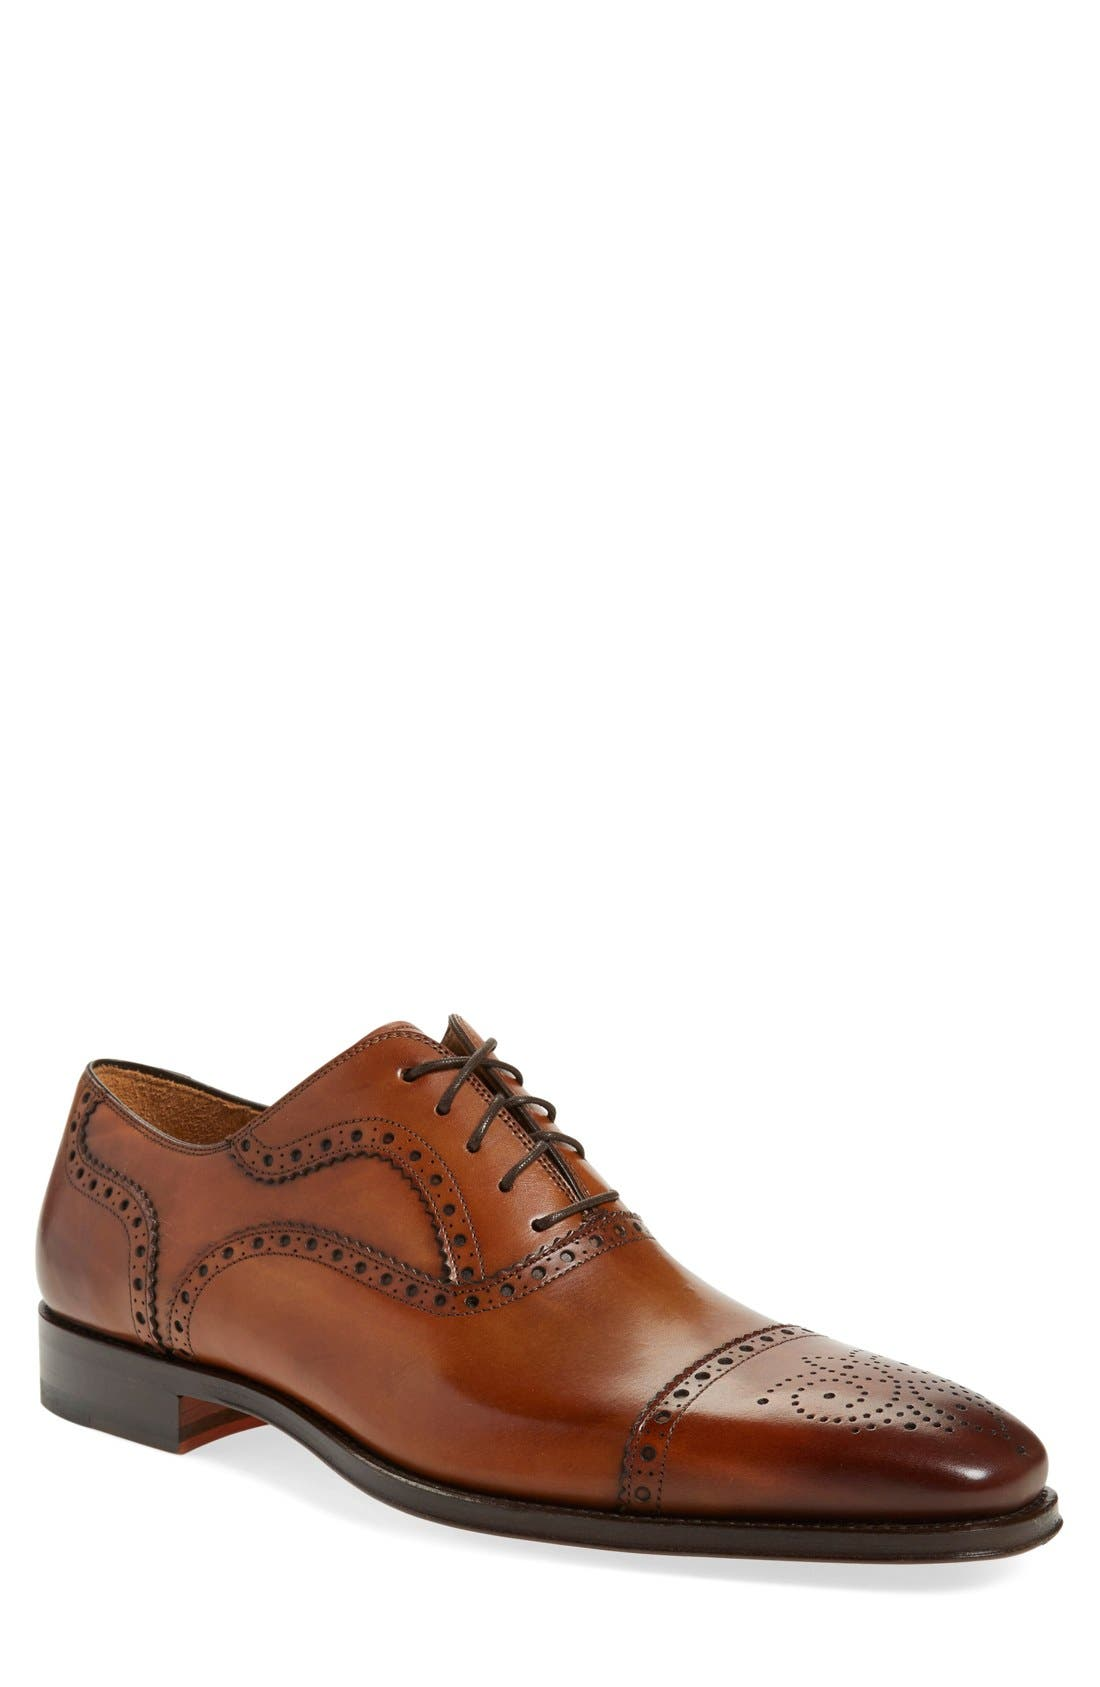 Men S Dress Shoes Nordstrom